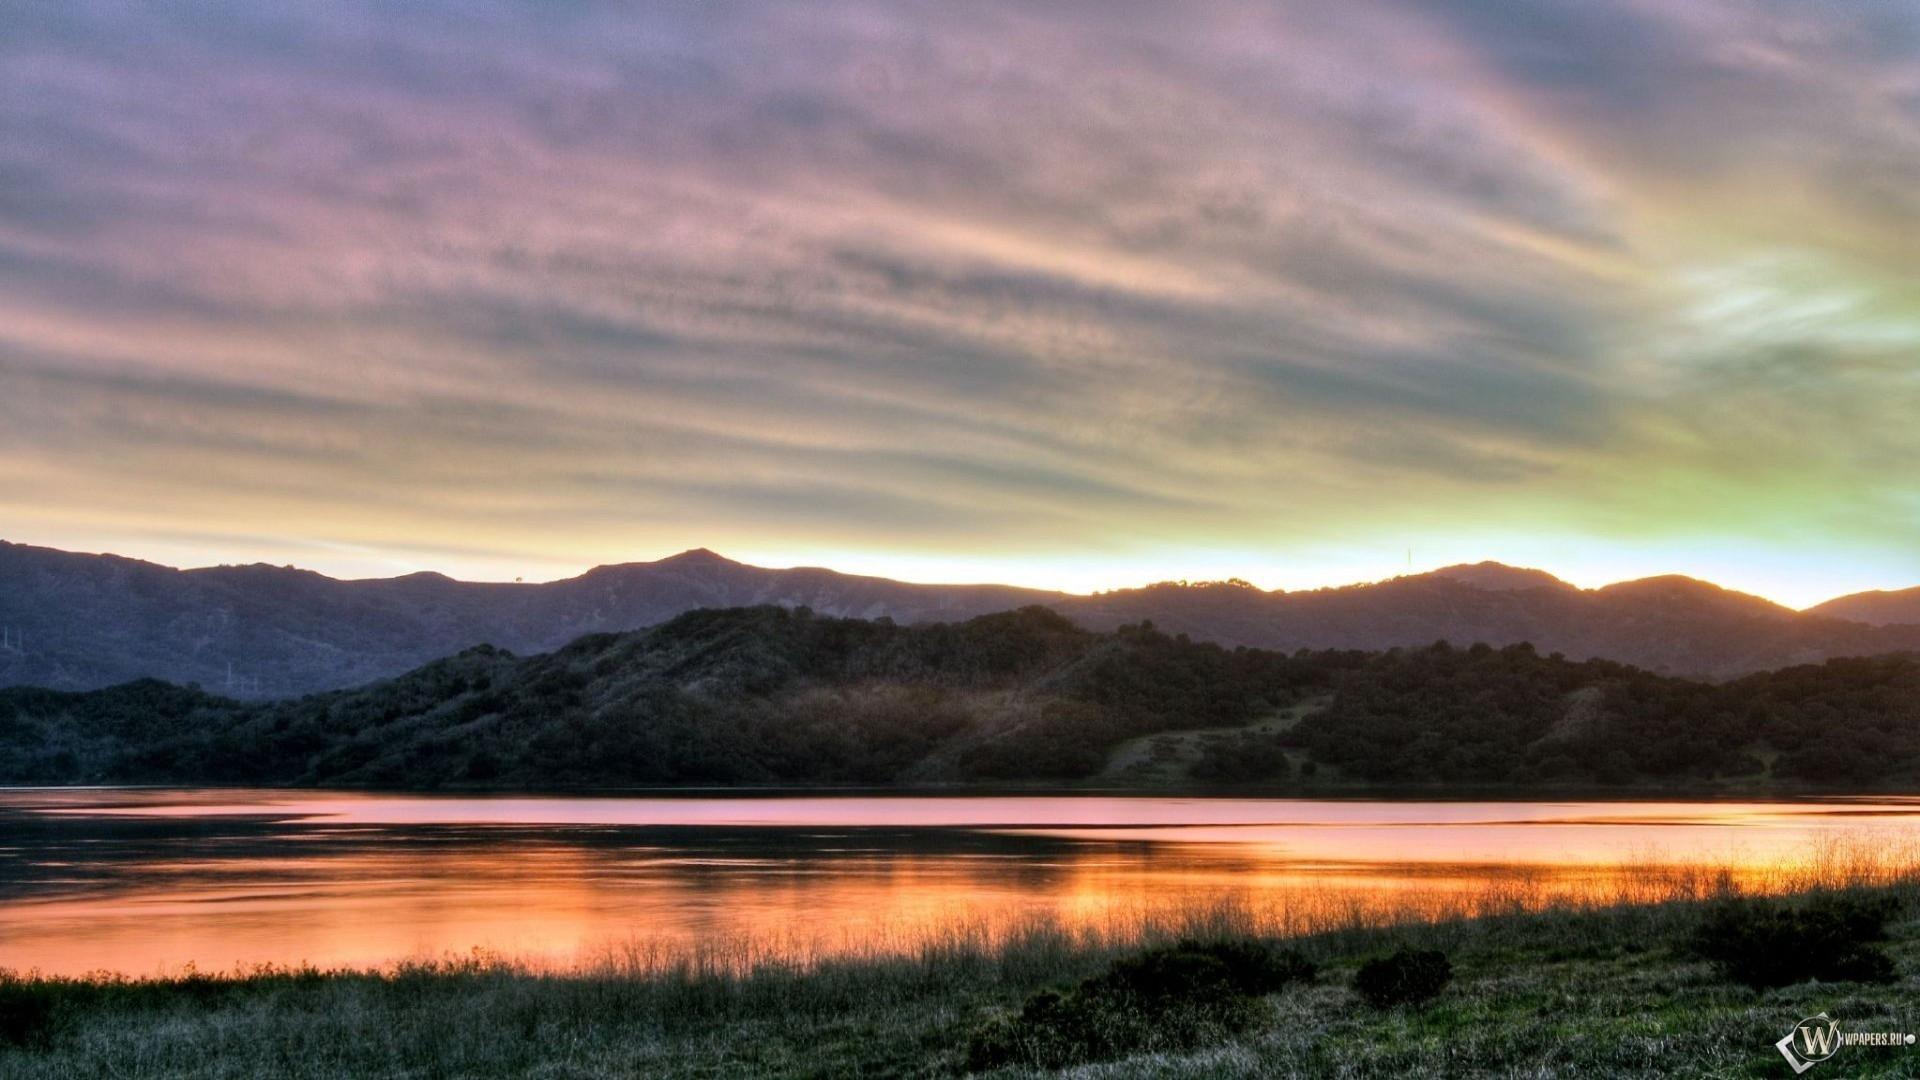 Восход над озером 1920x1080